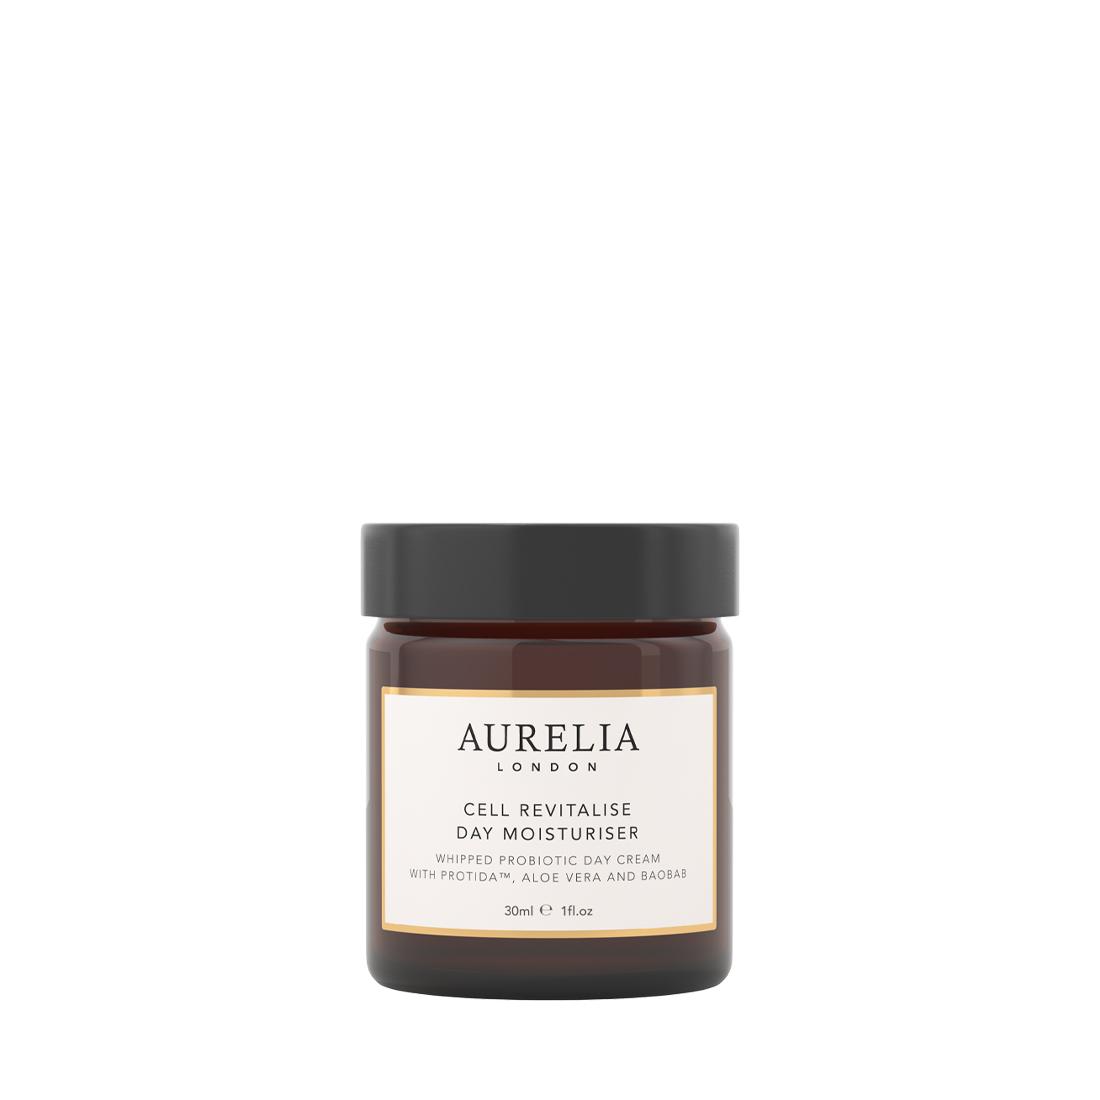 An image of Cell Revitalise Day Moisturiser Travel Size 30ml Aurelia London, Probiotic moist...